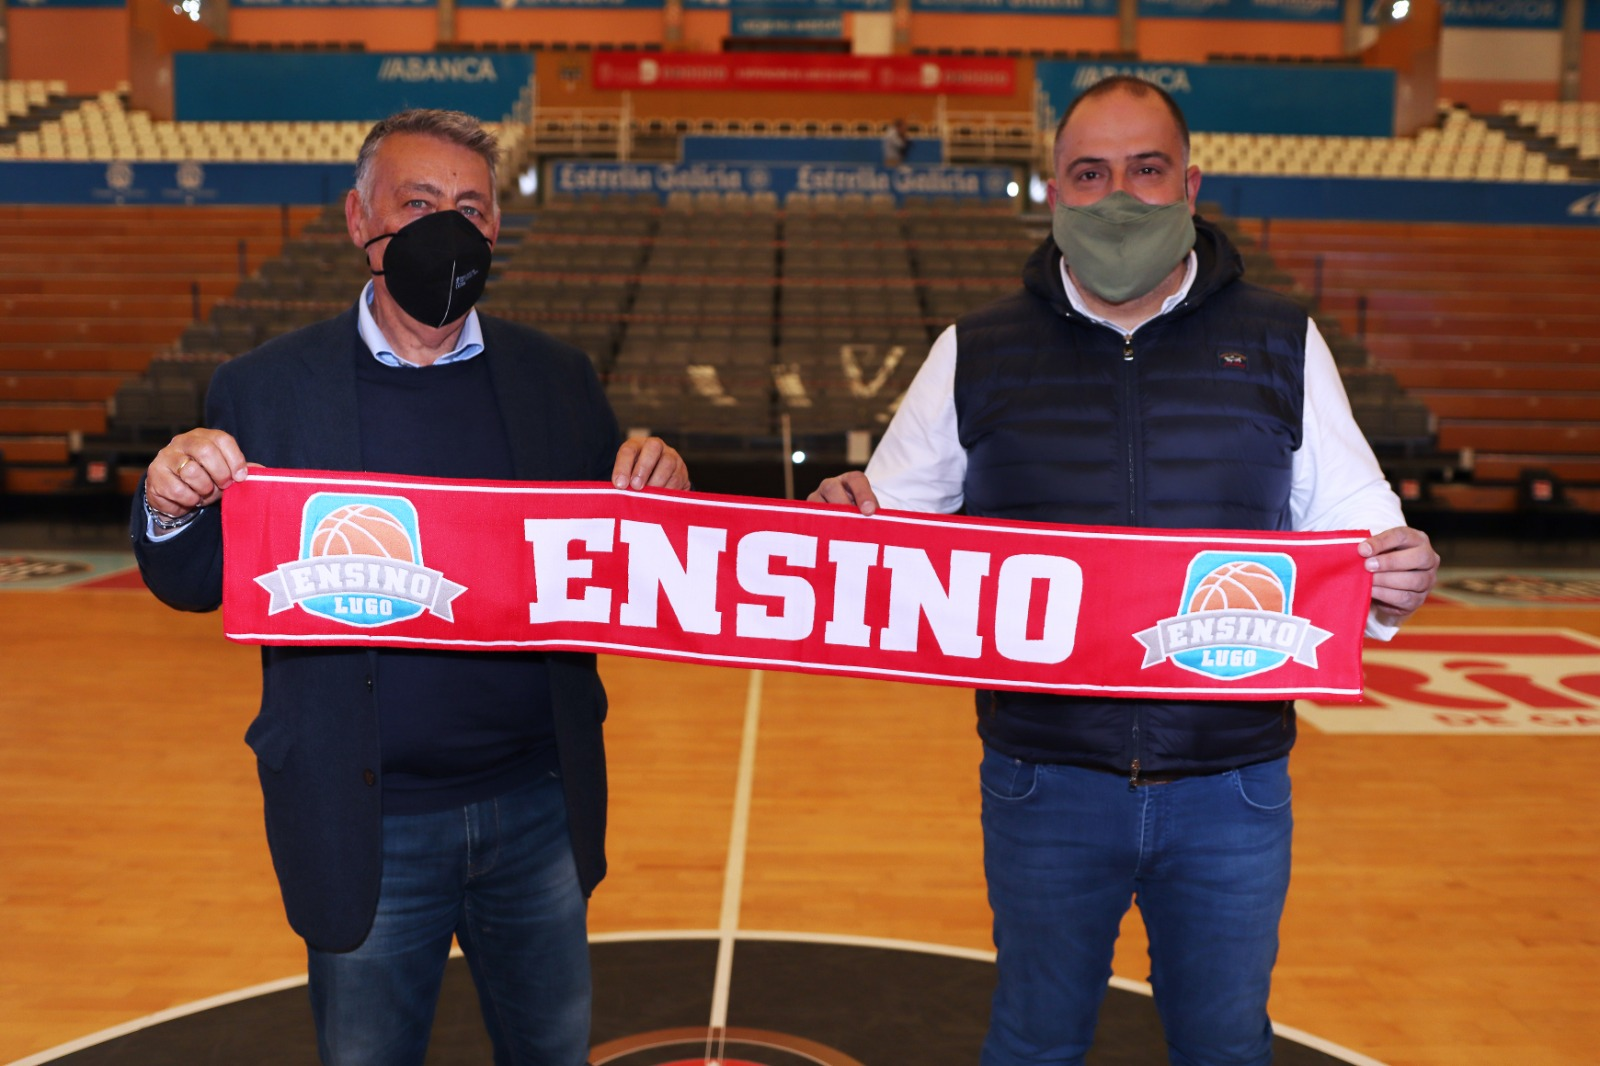 Presentación de Miguel Ángel Ortega como adestrador do Ensino / ENSINO